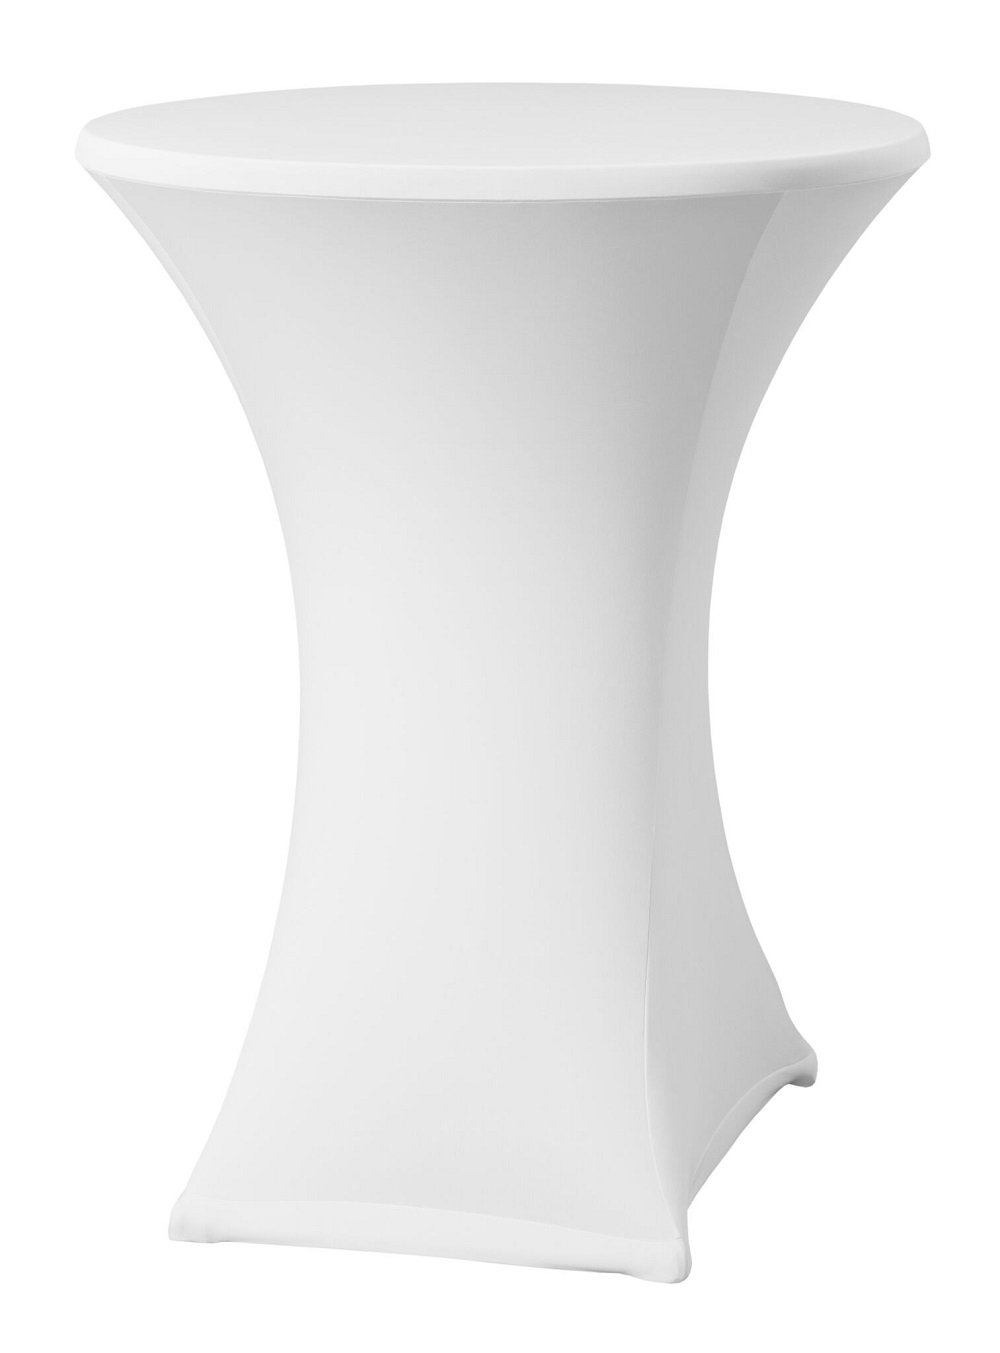 nappe table mange debout blanche ml locations. Black Bedroom Furniture Sets. Home Design Ideas